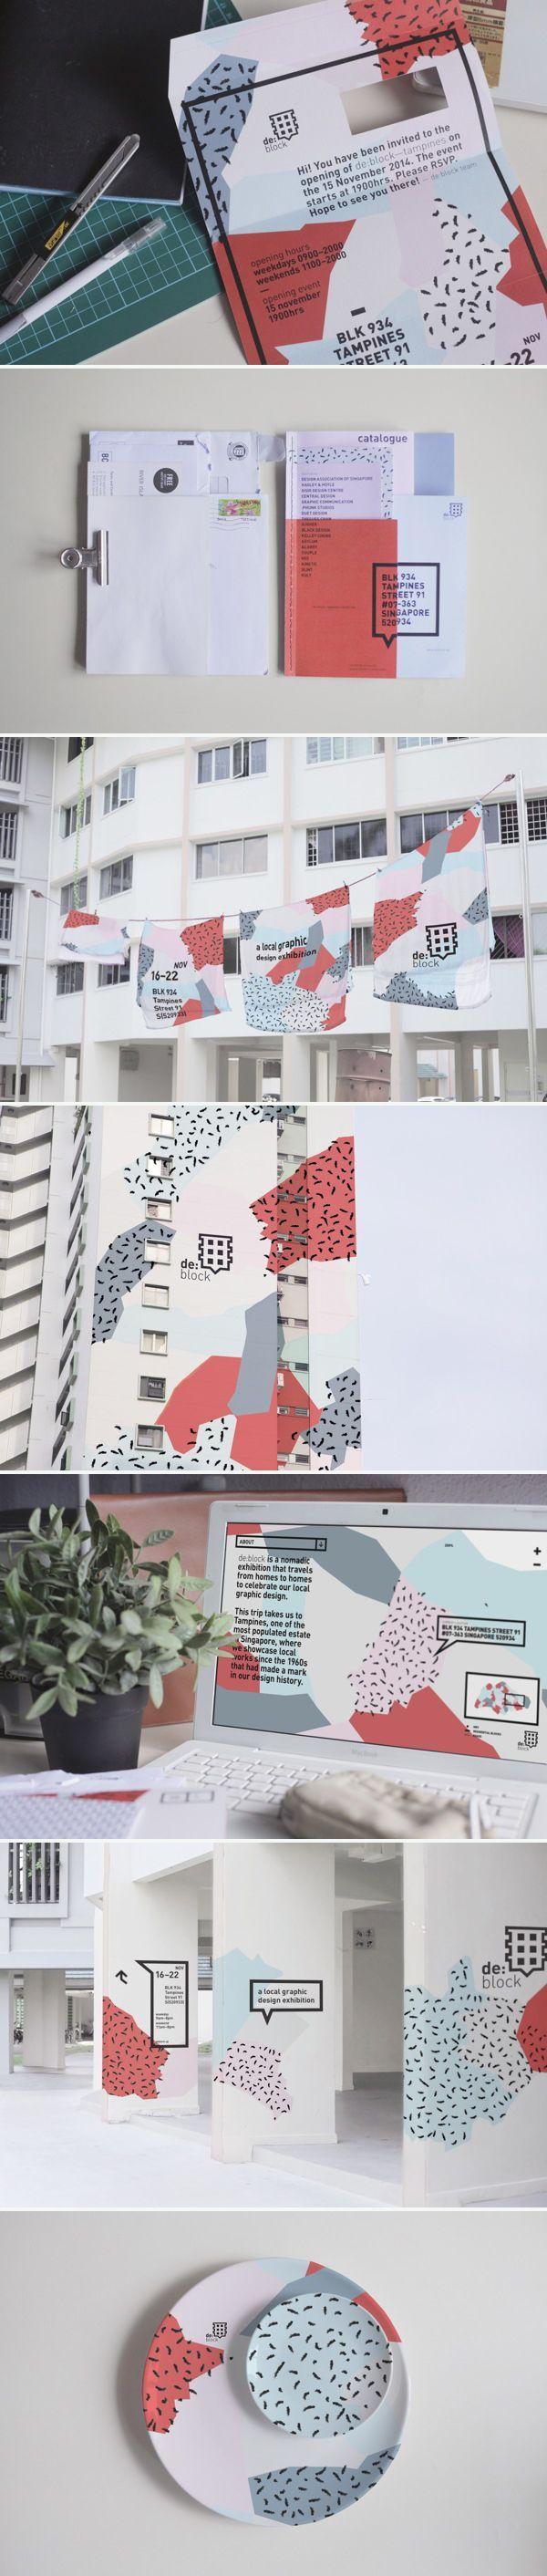 identity / de:block - exhibition design